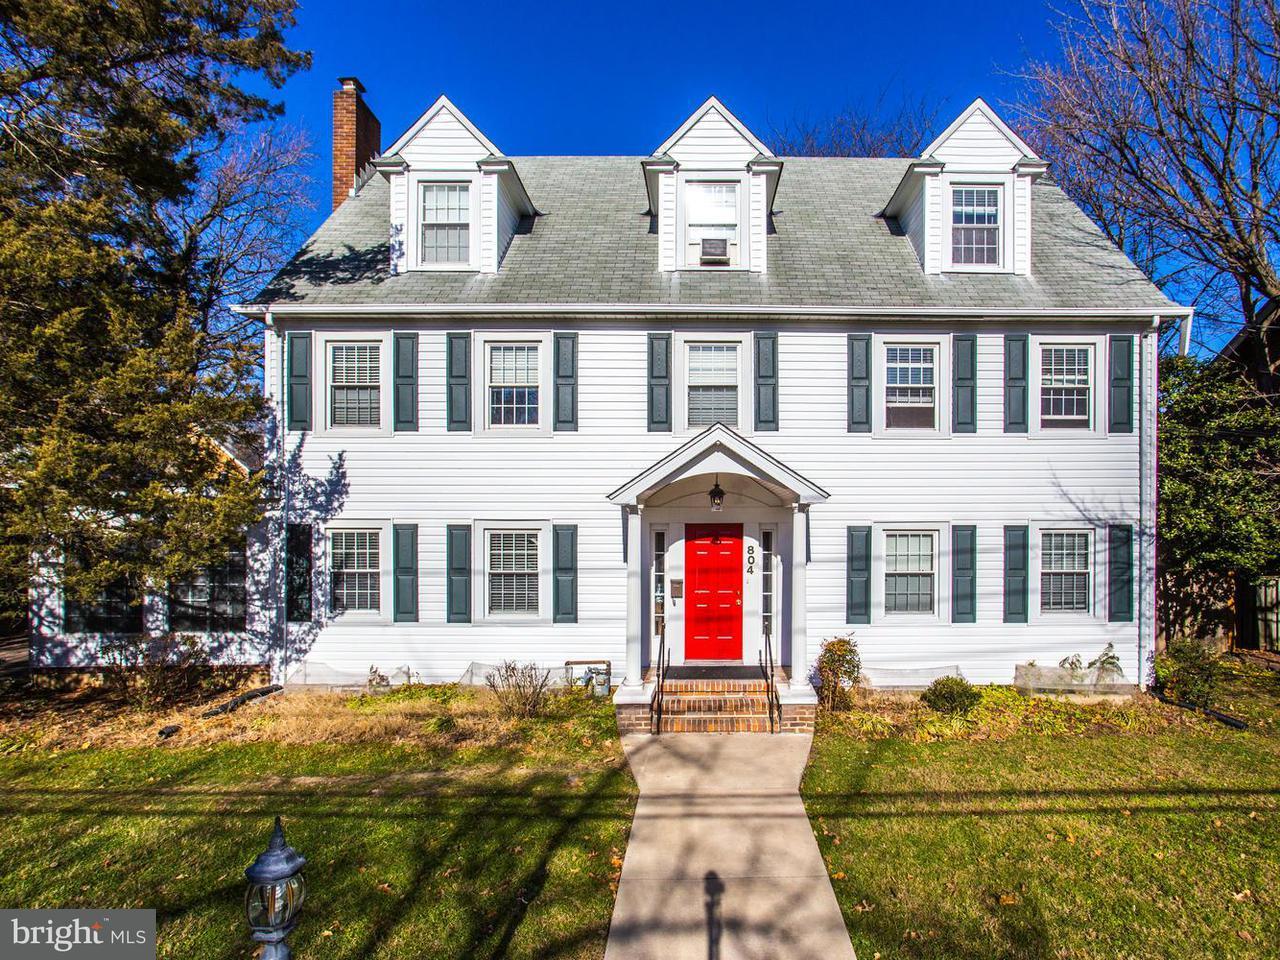 Single Family Home for Sale at 804 MAPLEWOOD Avenue 804 MAPLEWOOD Avenue Takoma Park, Maryland 20912 United States